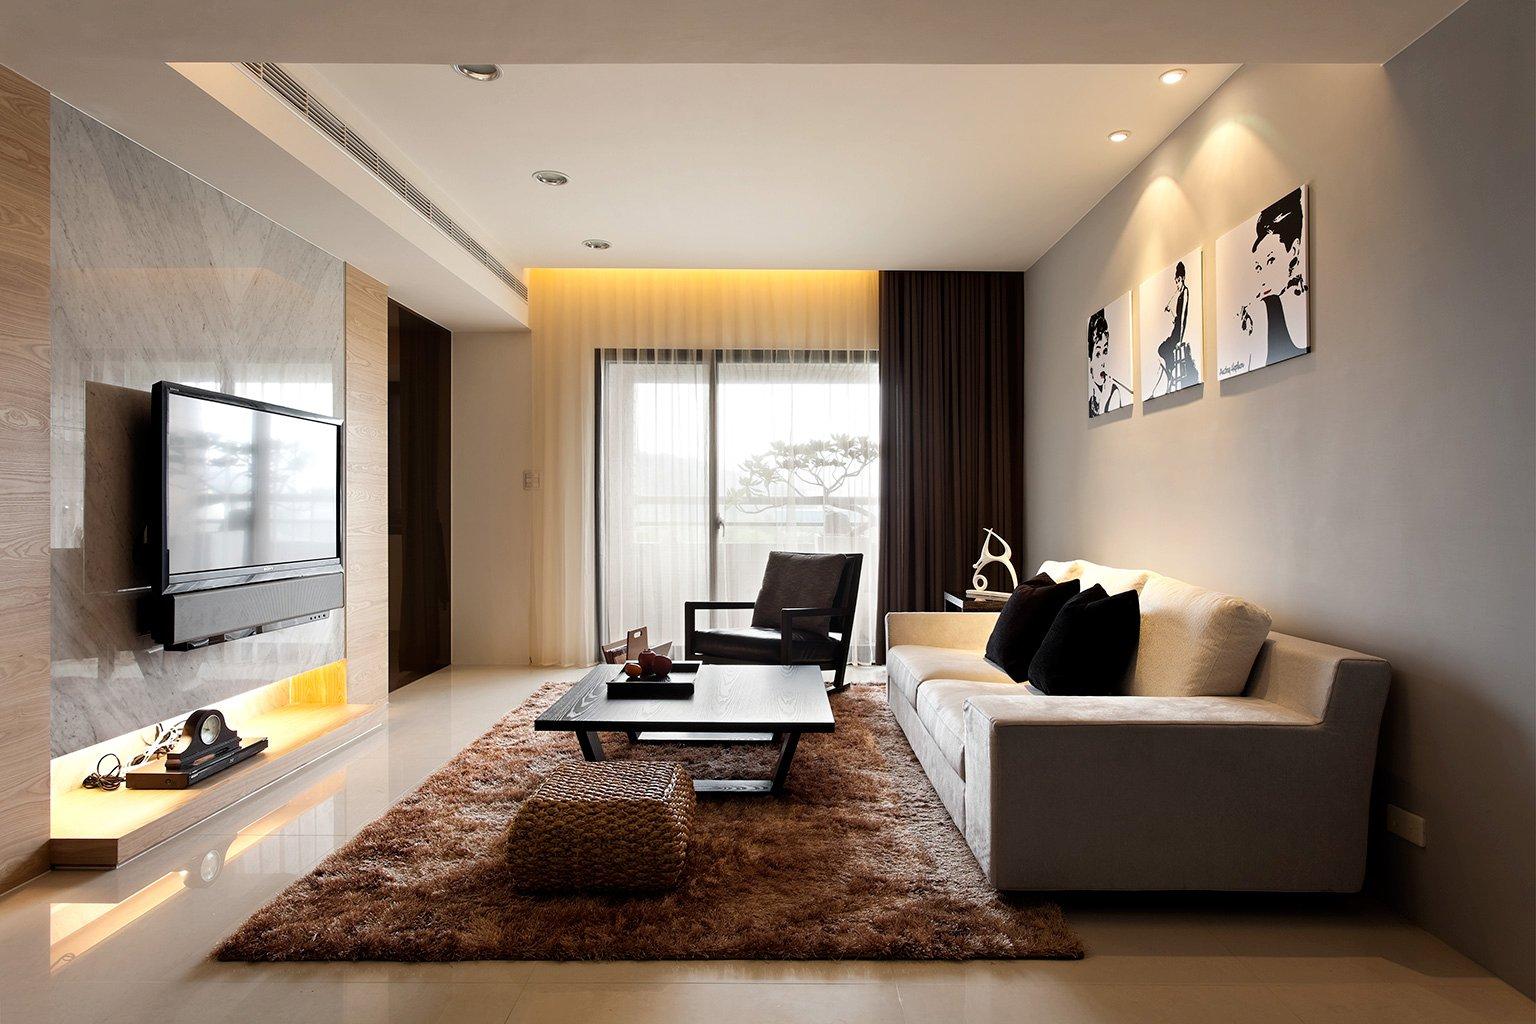 Modern Living Room Design Ideas 2013 And Modern Living Room Design Ideas  With Theater 2013 Throughout